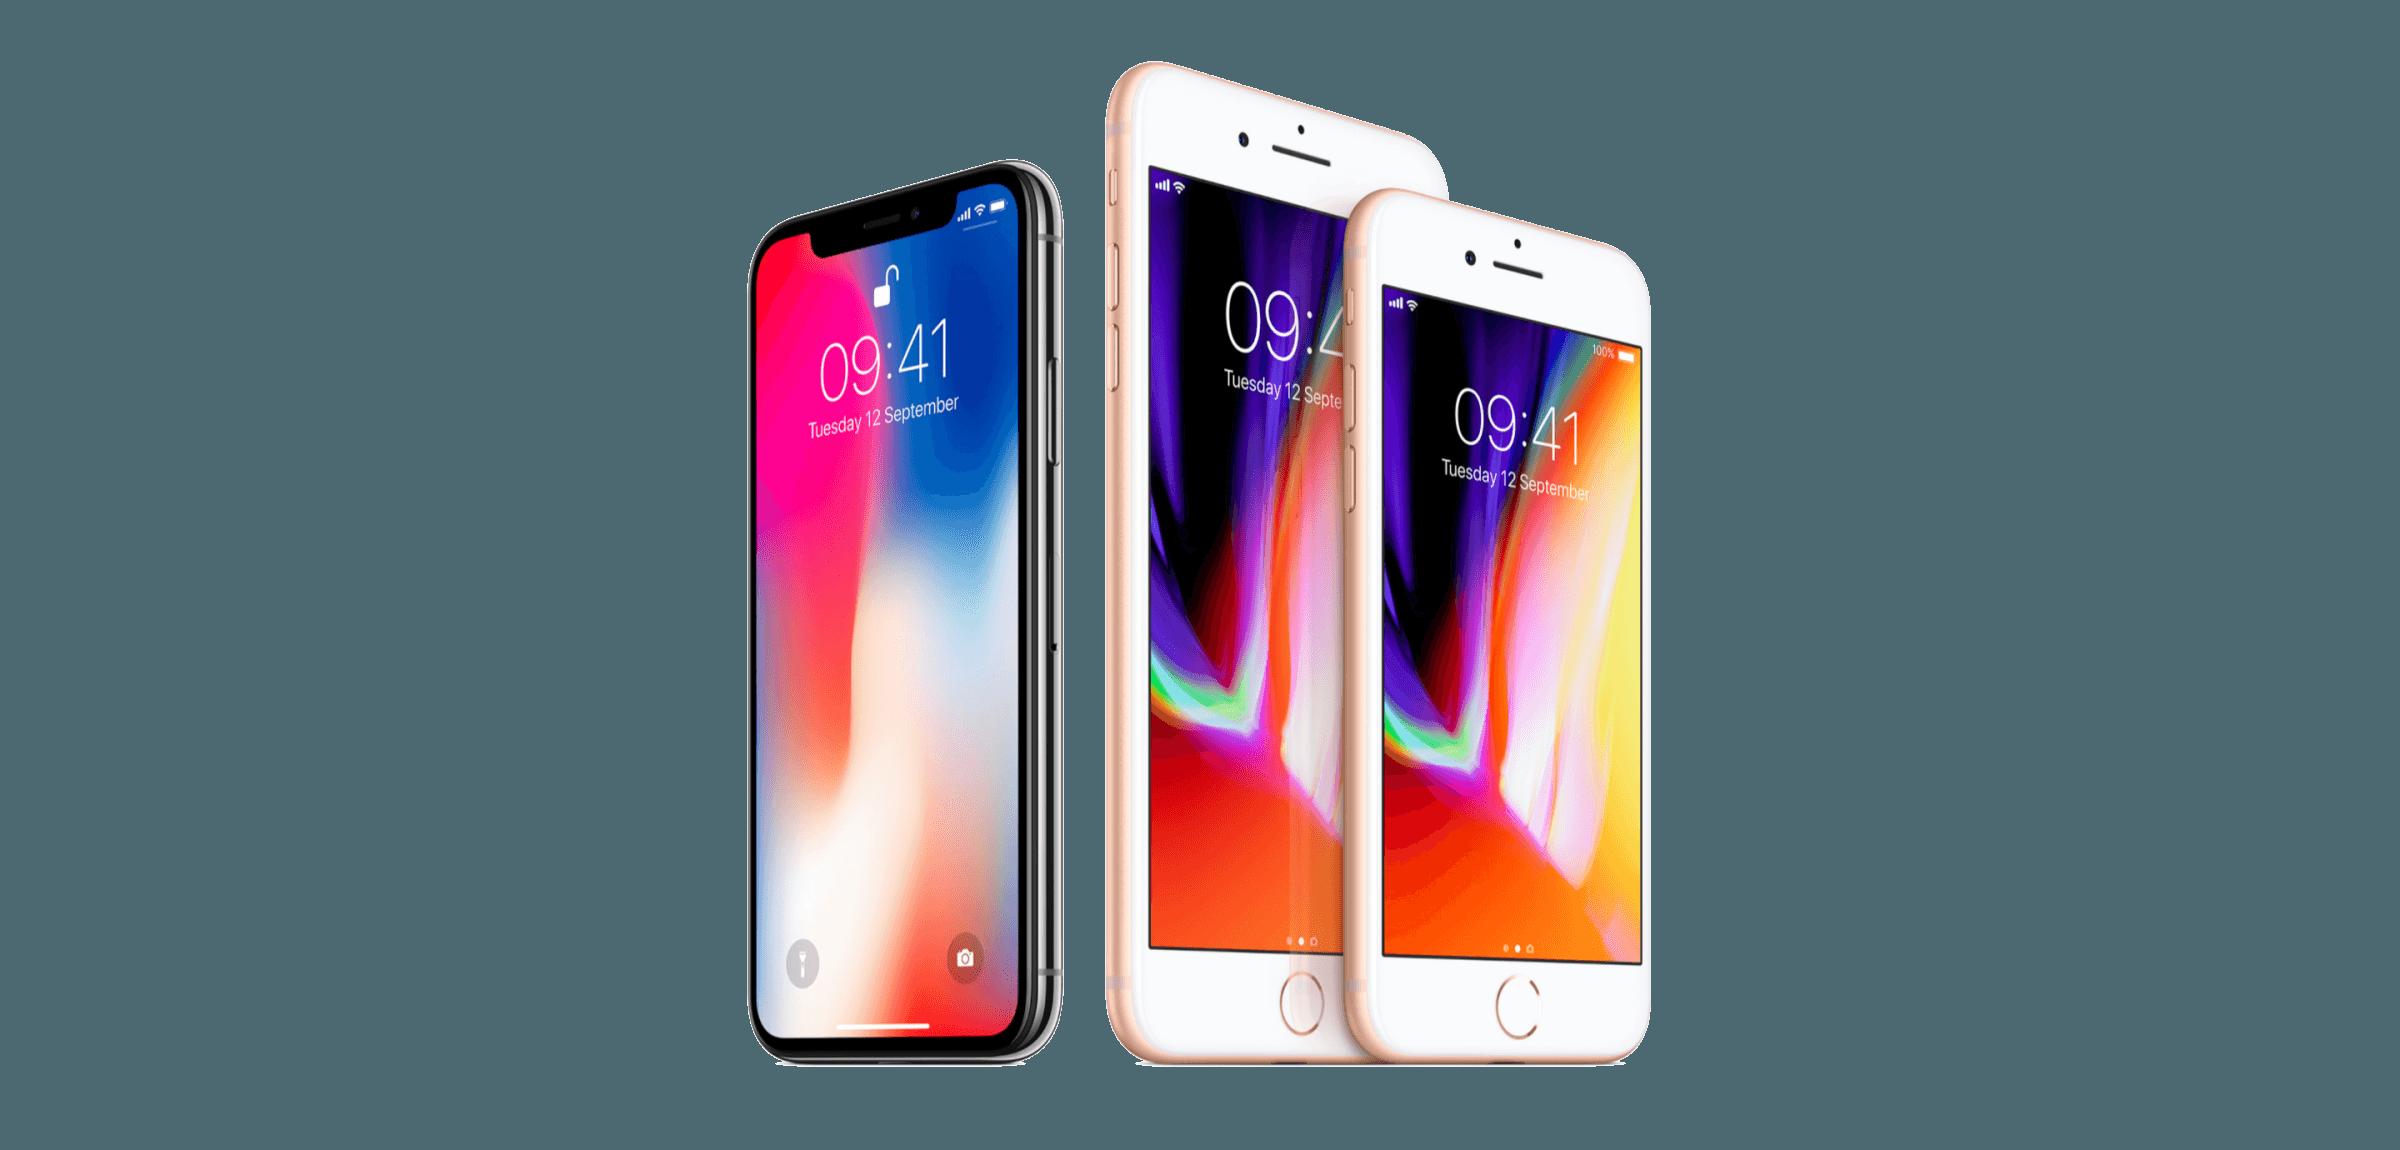 iphone 8 plus refurbished